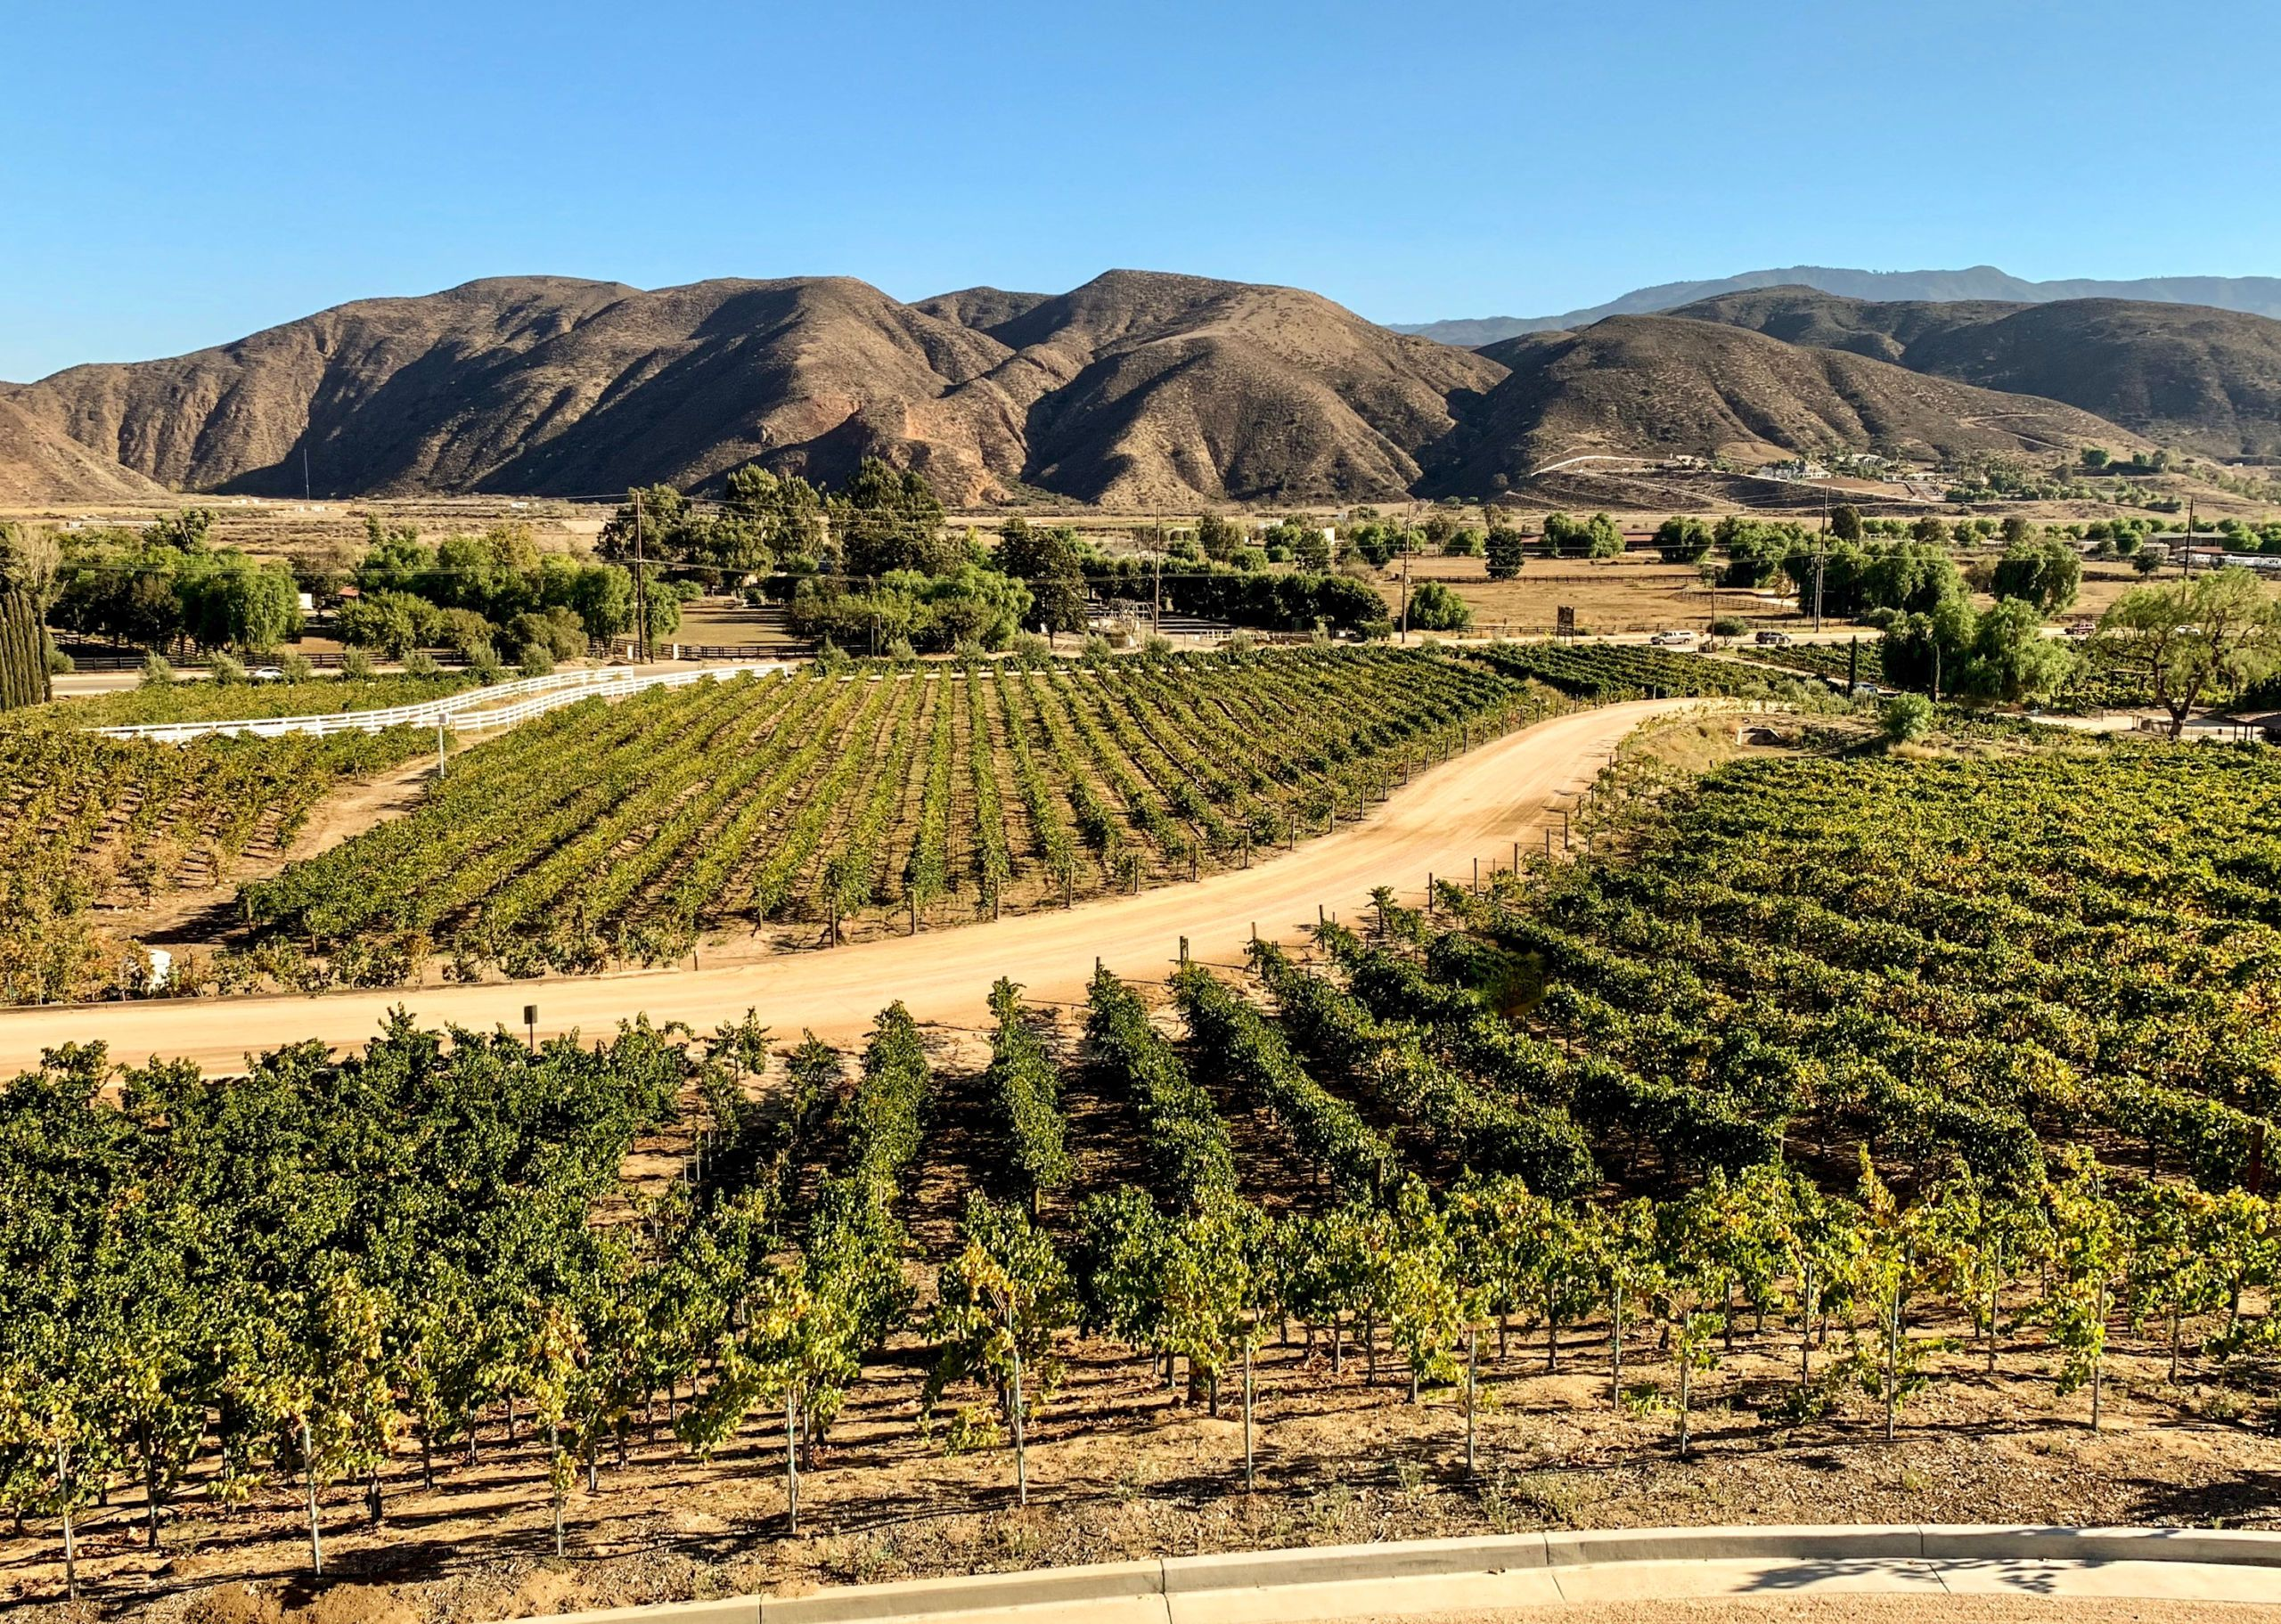 California's Temecula Valley wine